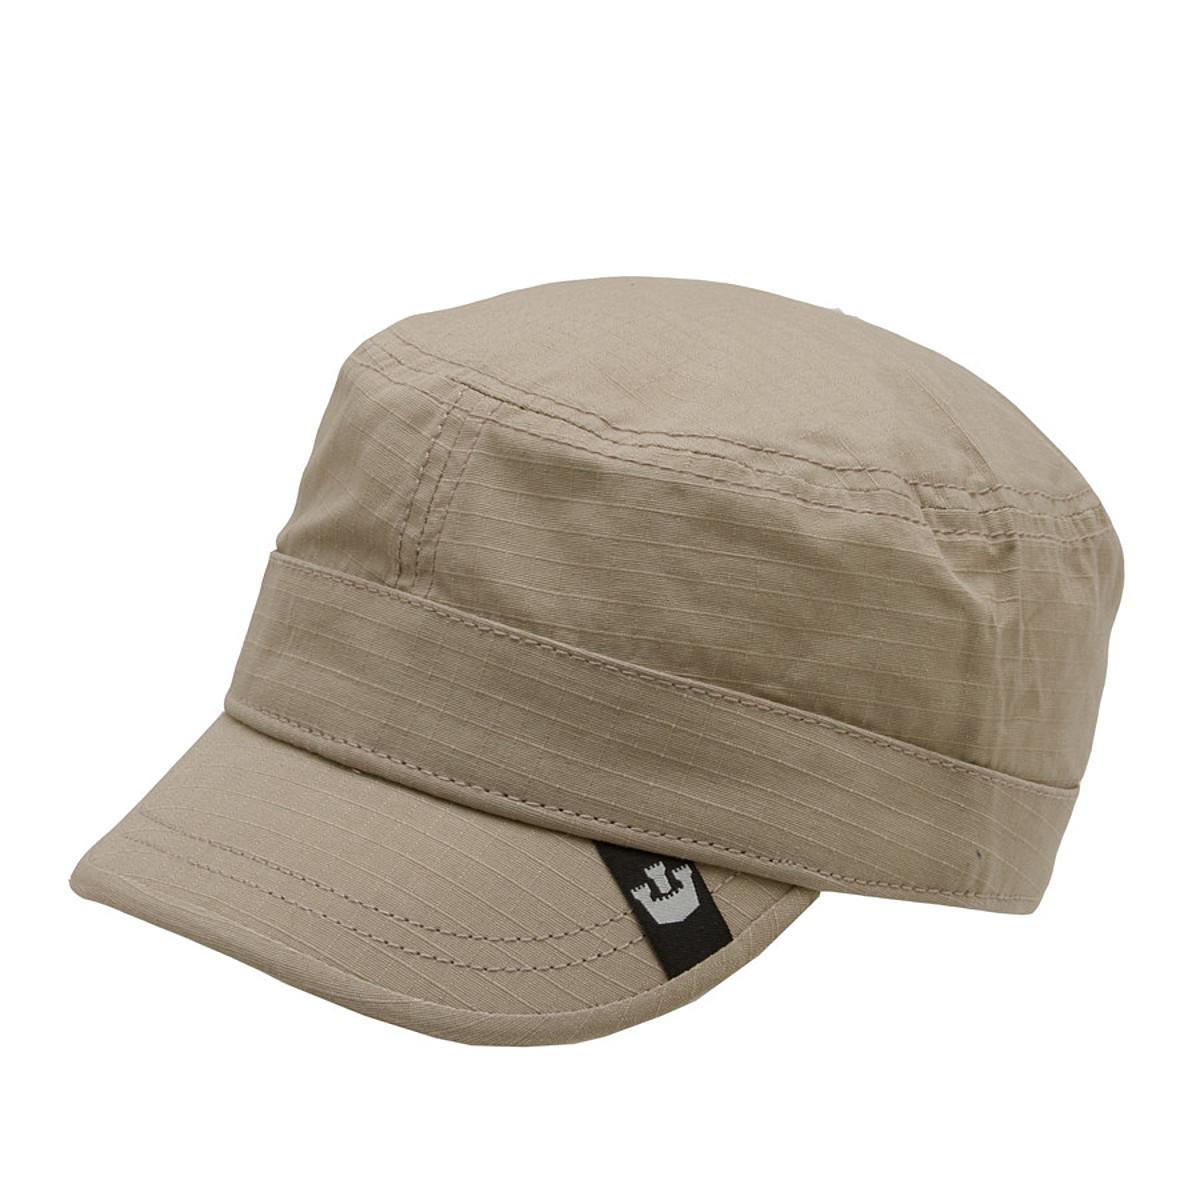 Lyst - Goorin Bros Private Cadet Hat for Men 127d9df5fdf